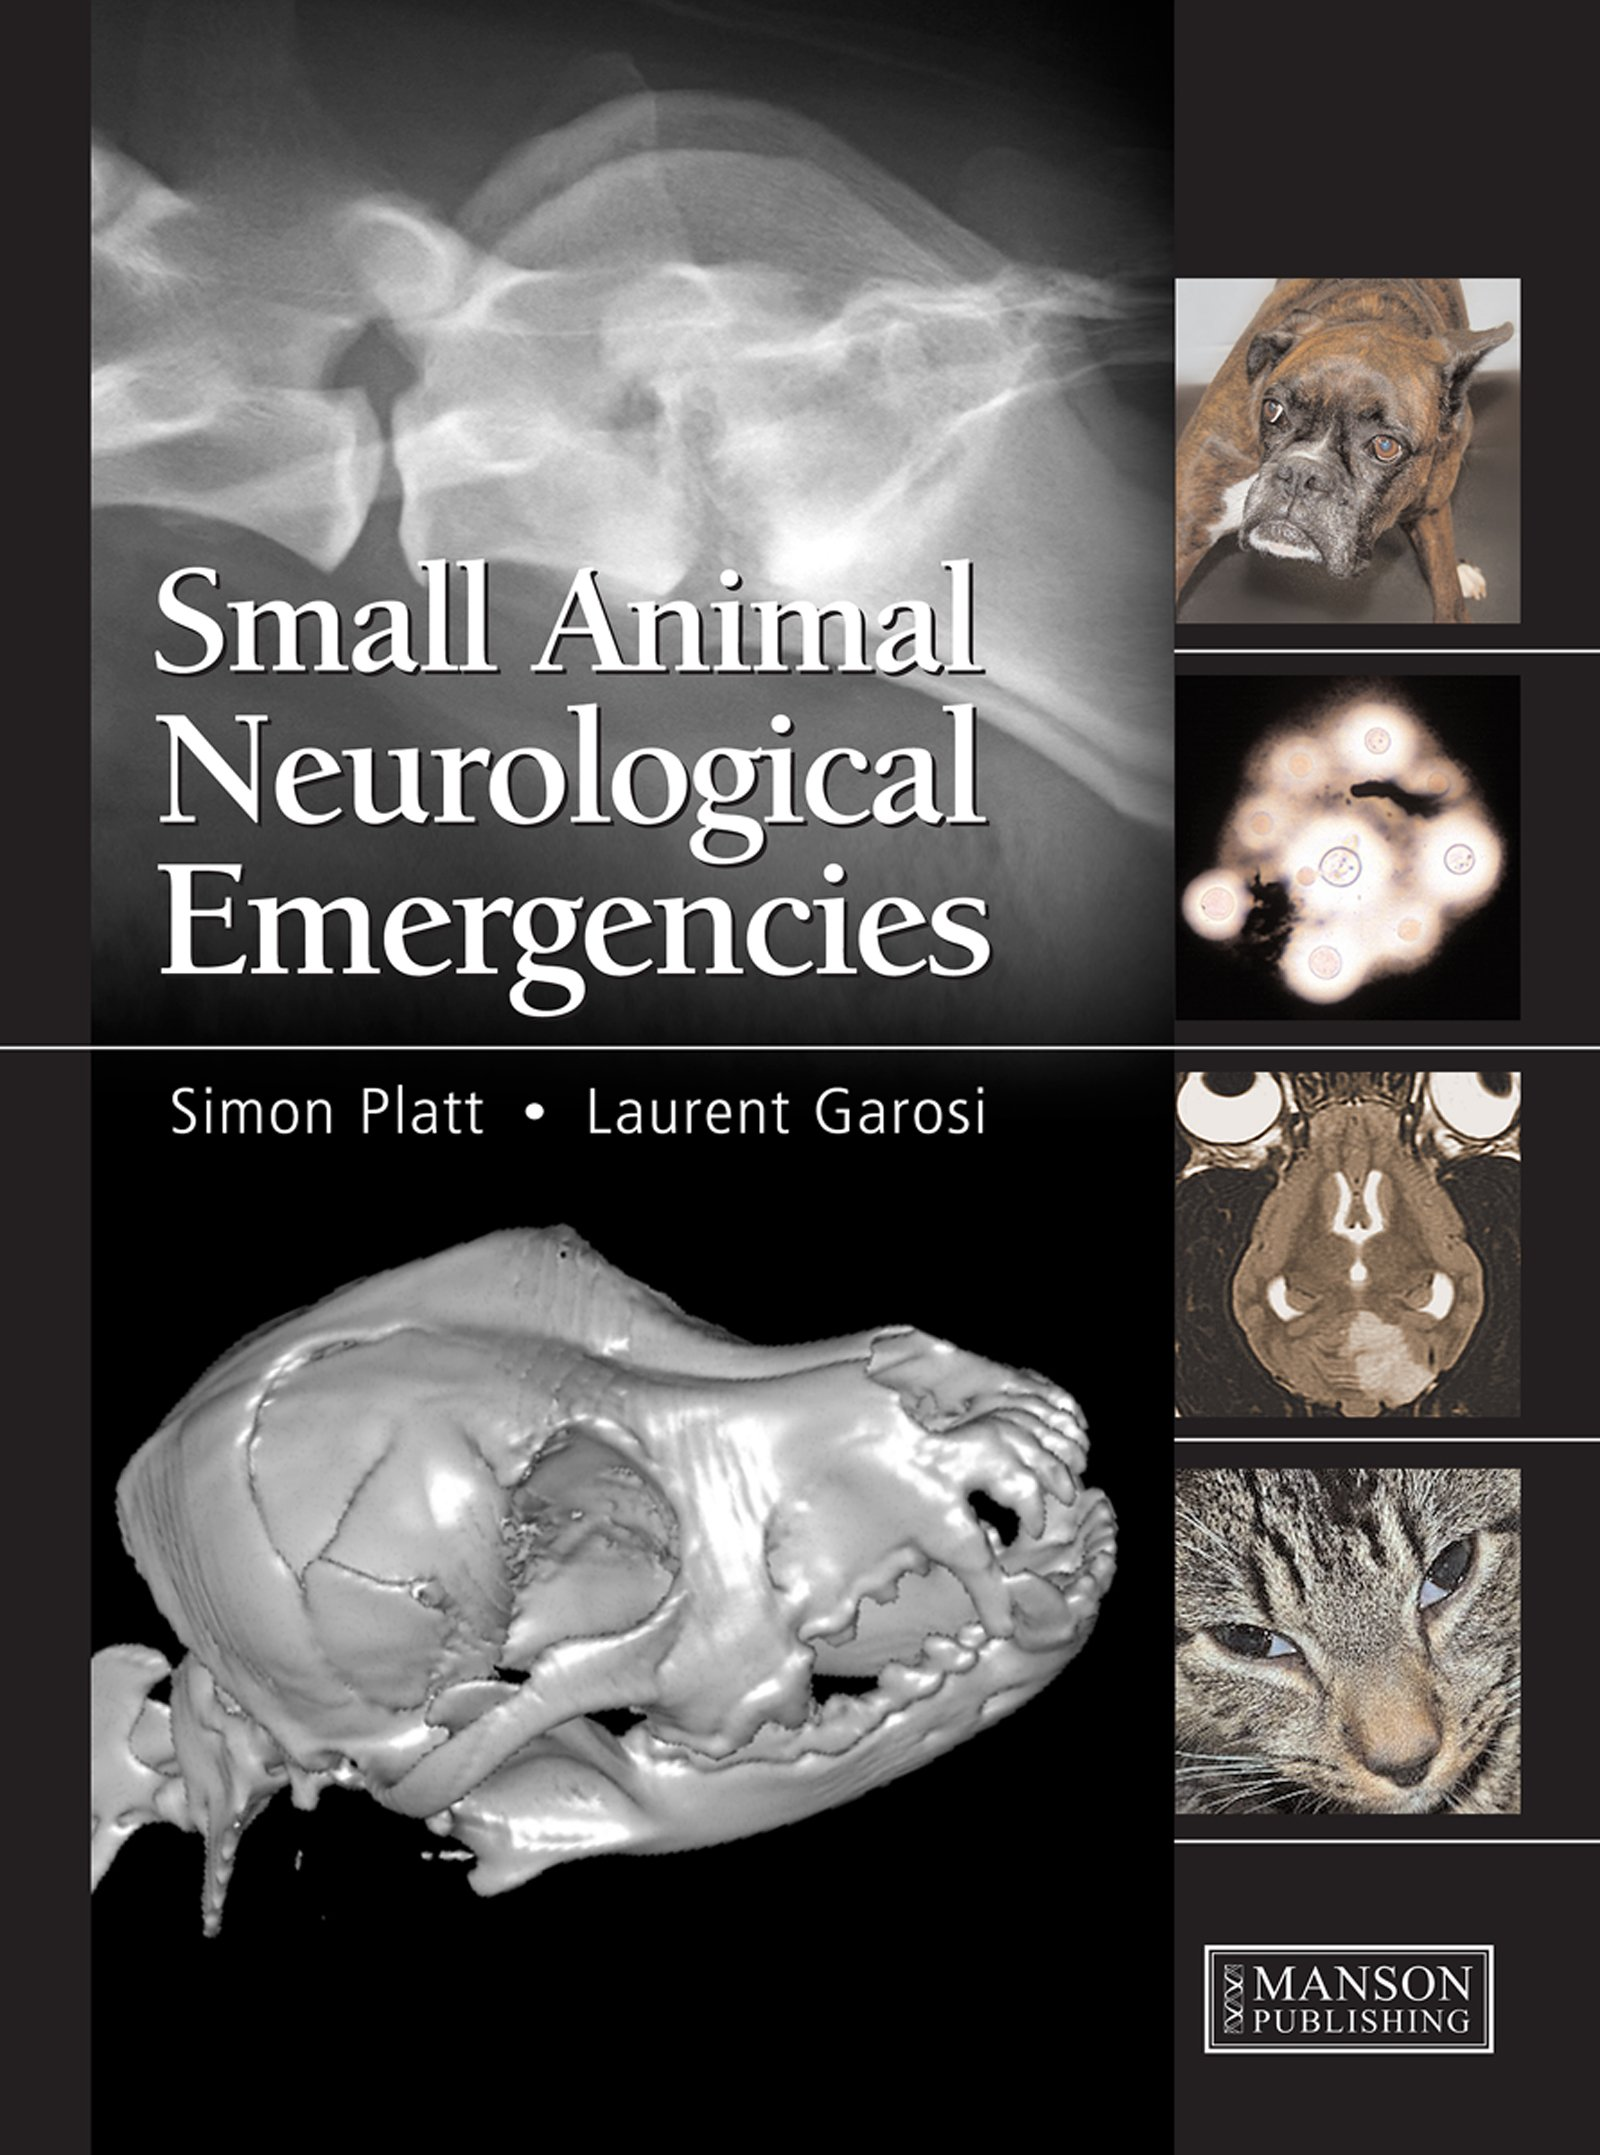 Small Animal Neurological Emergencies (English Edition)